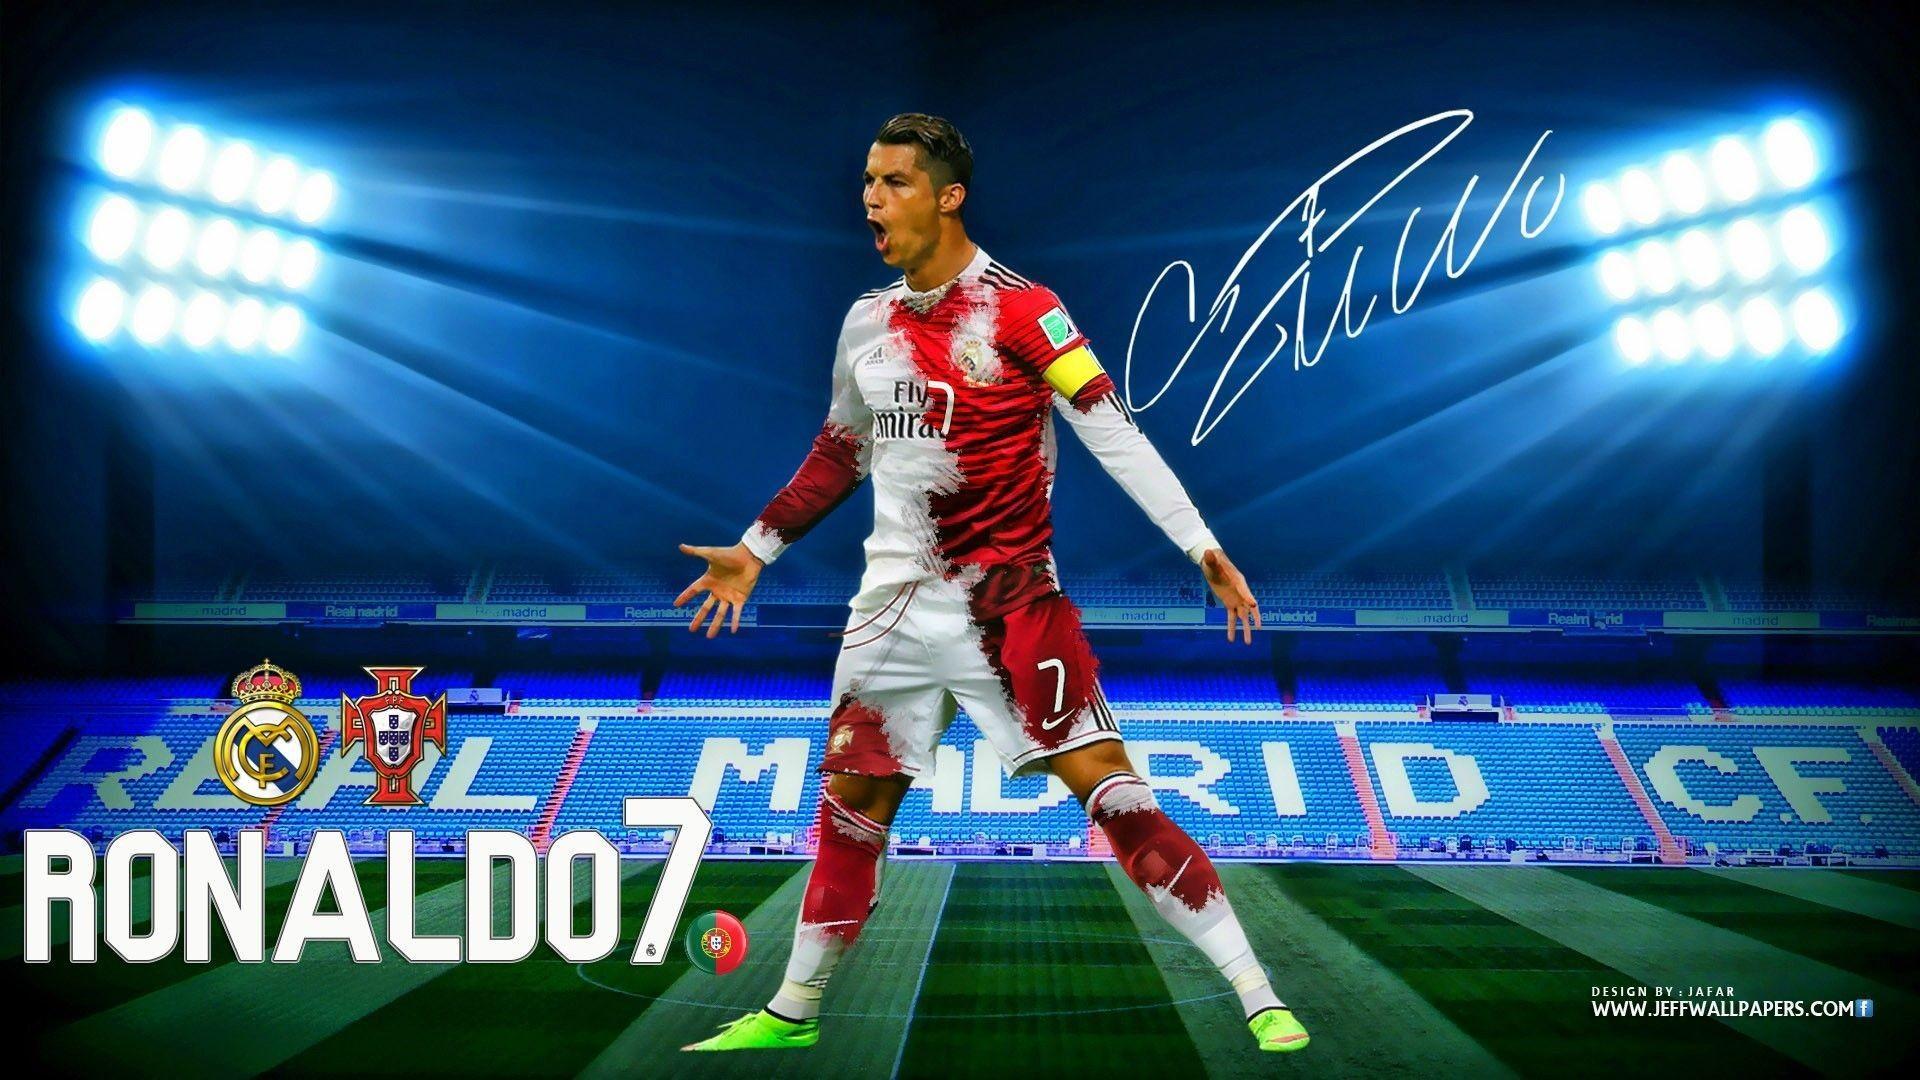 Res: 1920x1080, Cristiano Ronaldo 7 Wallpapers 2015 - Wallpaper Cave